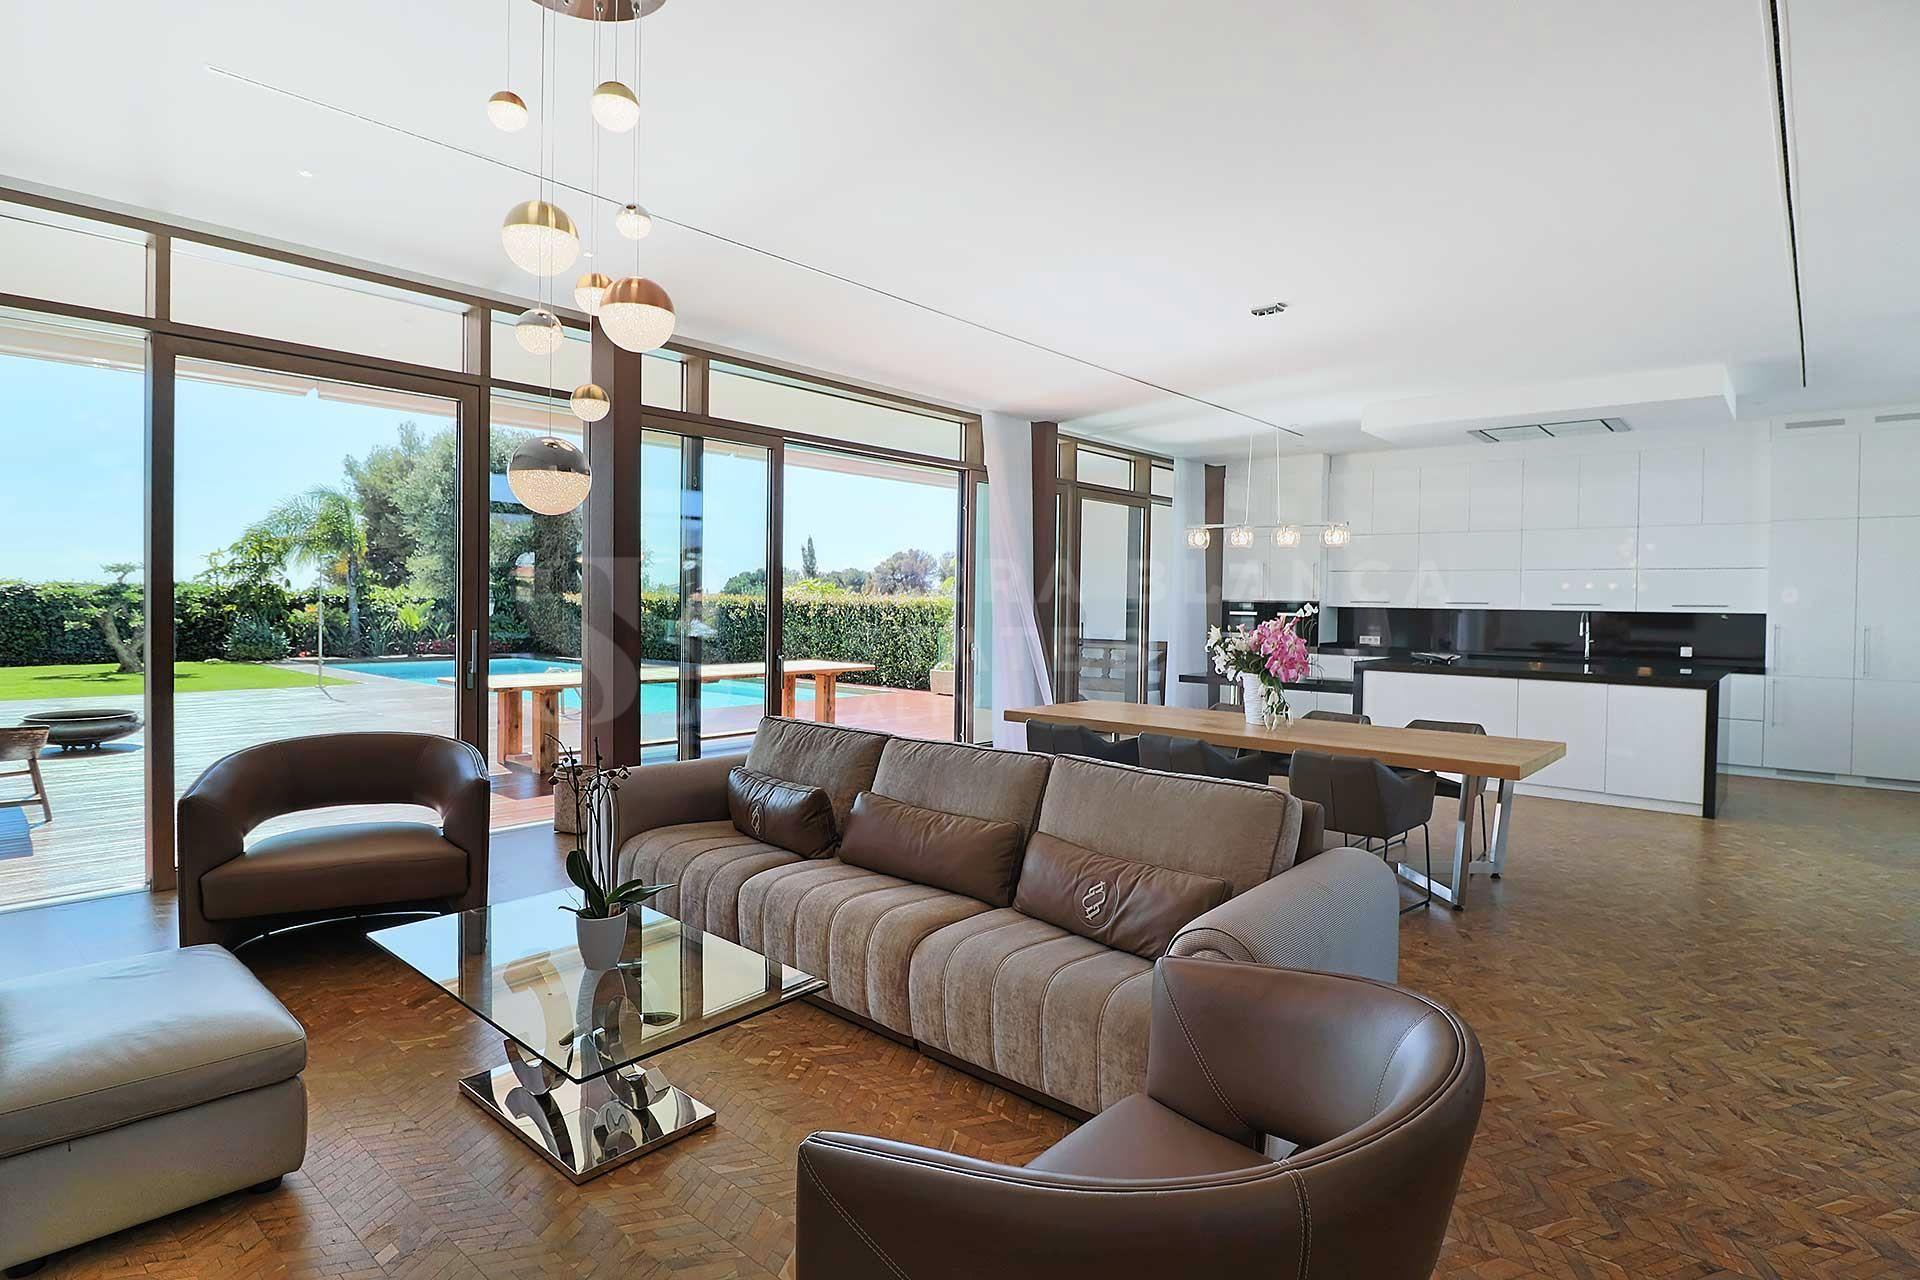 Villa Contemporánea a un Paso de Puerto Banús